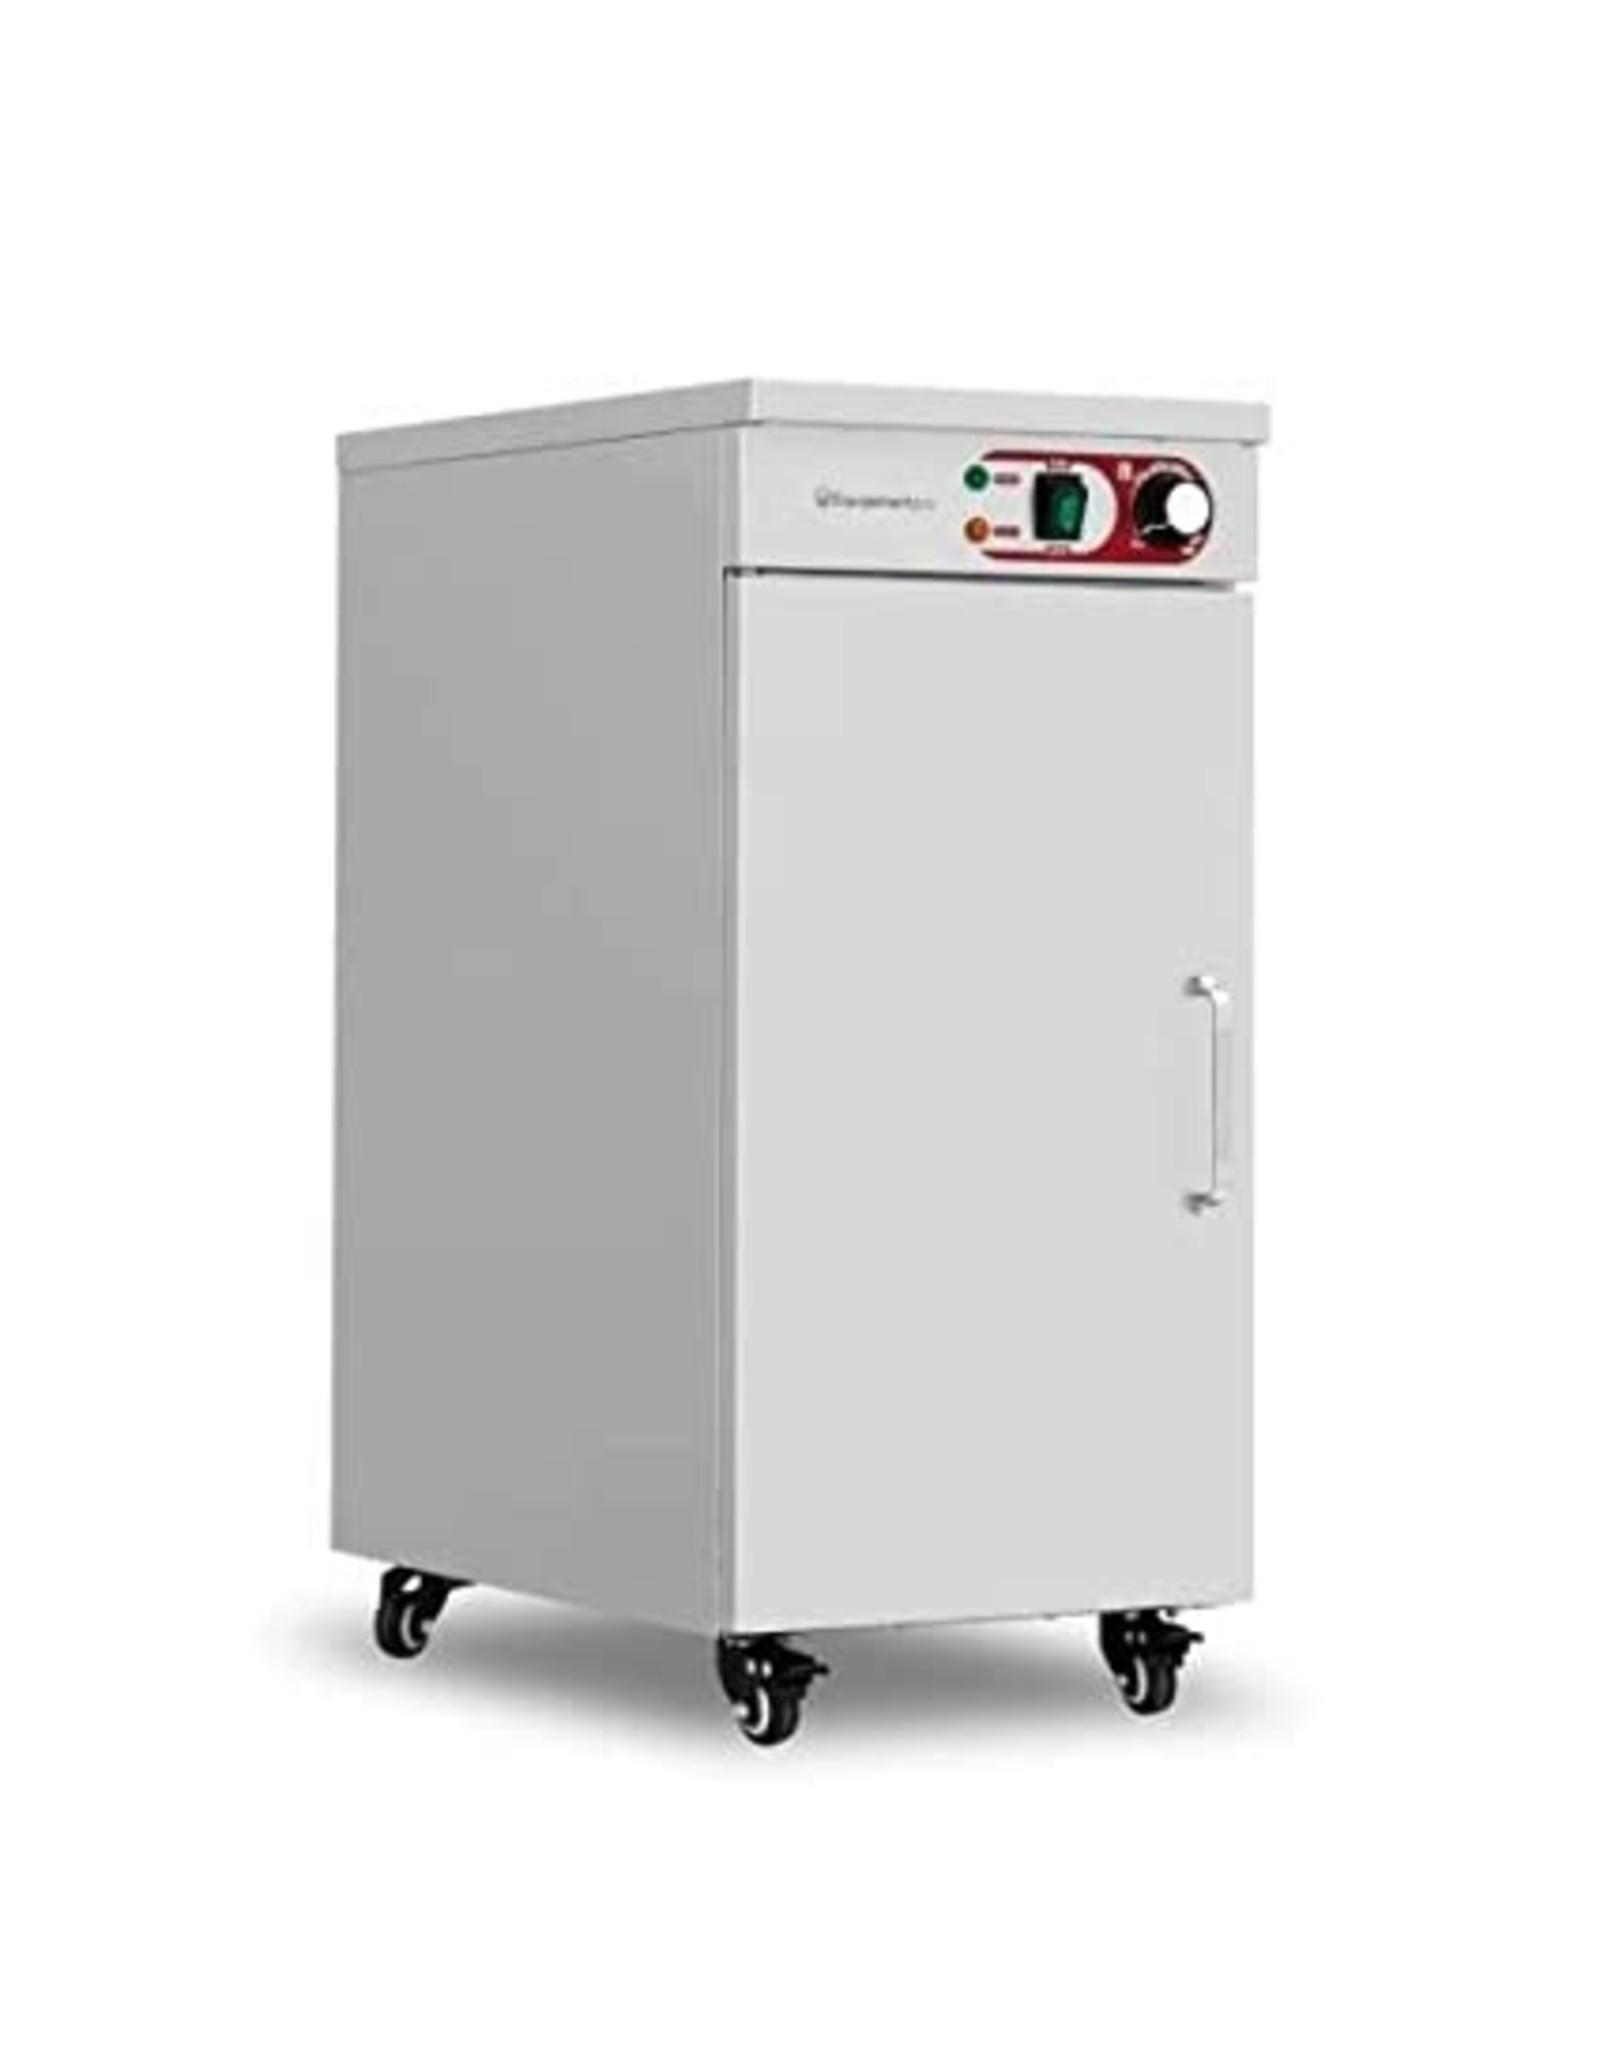 Q-Gastro Q-Gastro PW-120 Professionele Elektrische Bordenwarmer 230V (Nieuw)